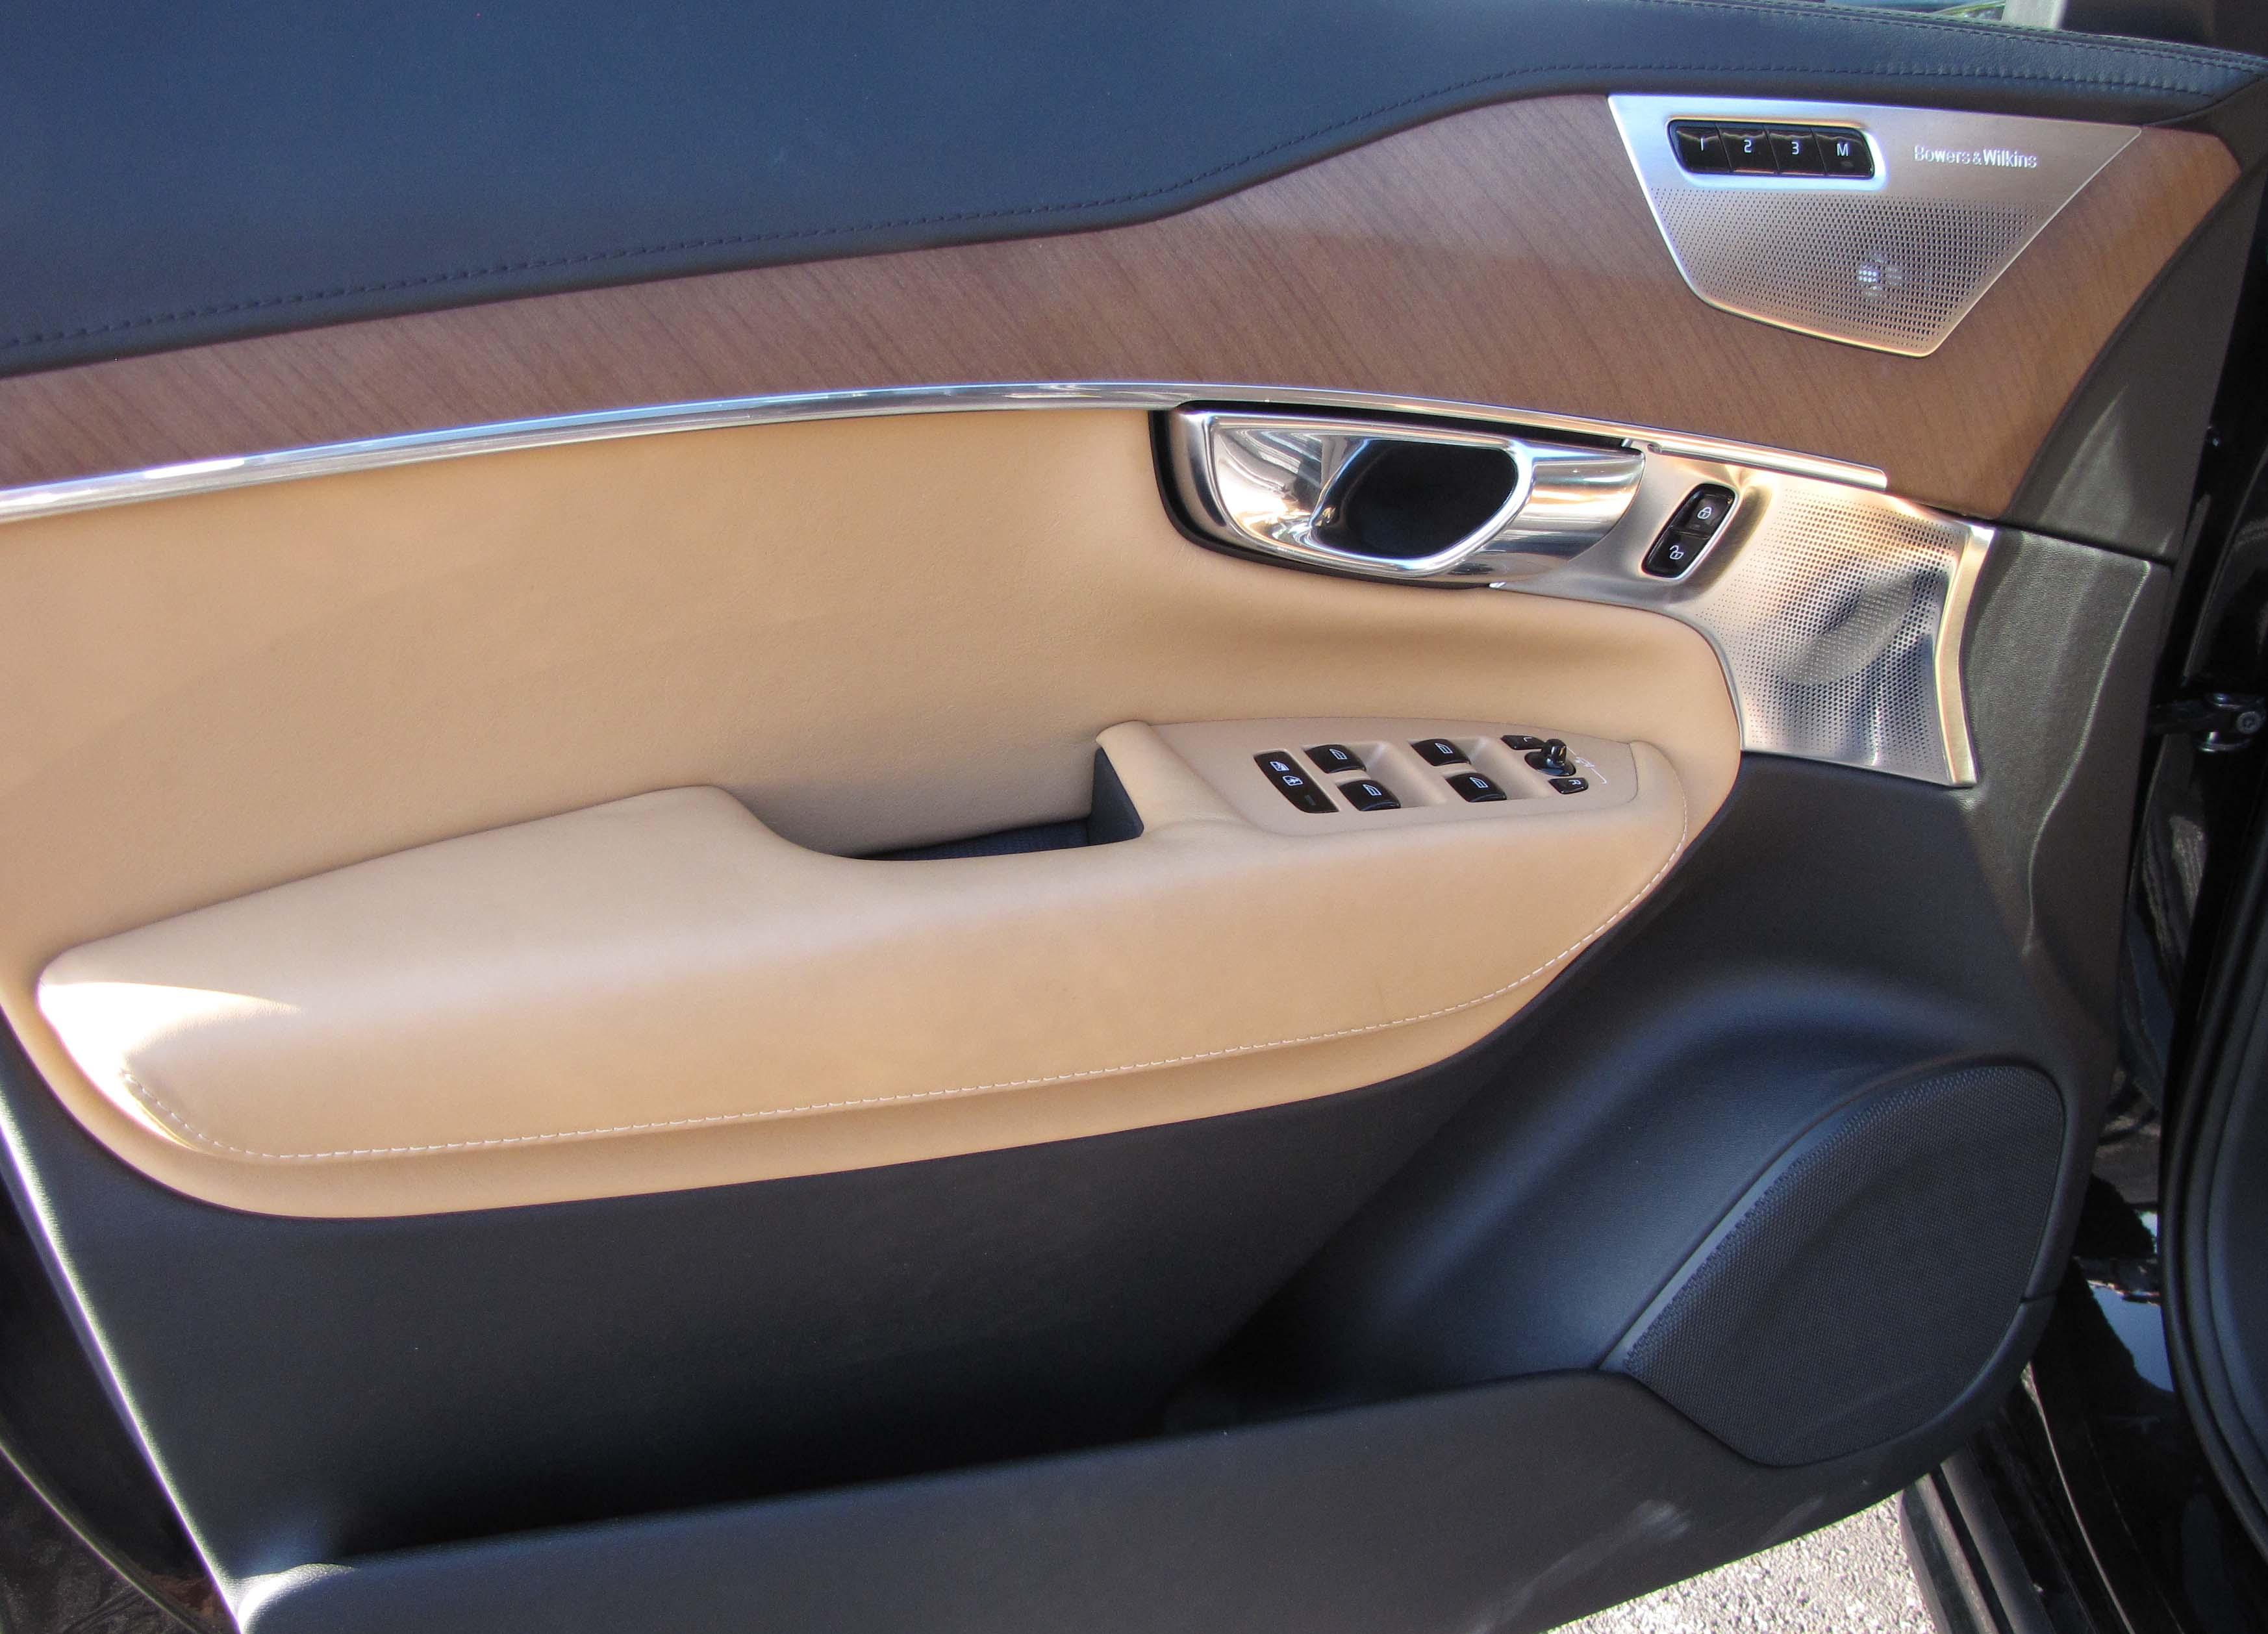 2016 Volvo Xc90 T6 Awd Inscription Savage On Wheels